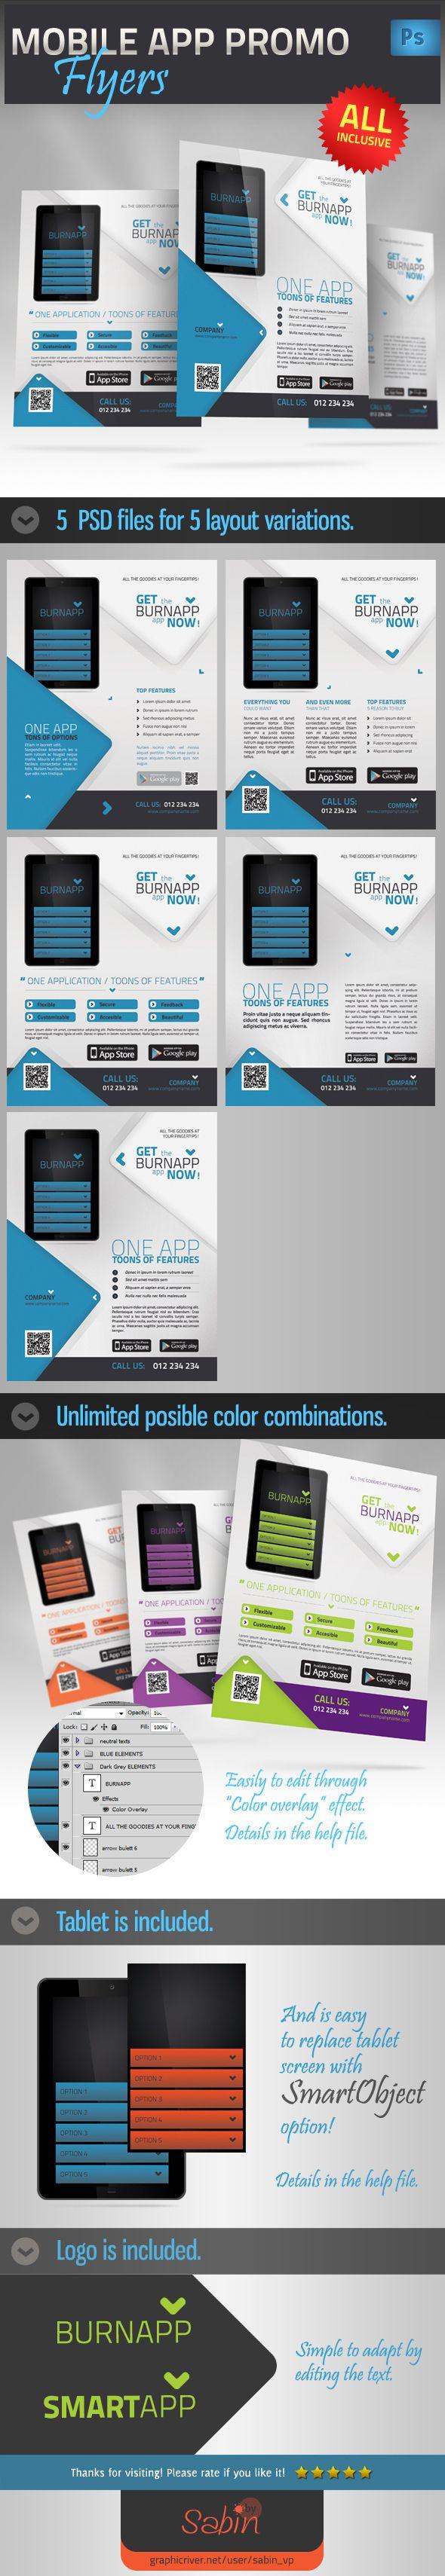 Mobile App Promotion Flyer by Valentin Sabin Plesa, via Behance